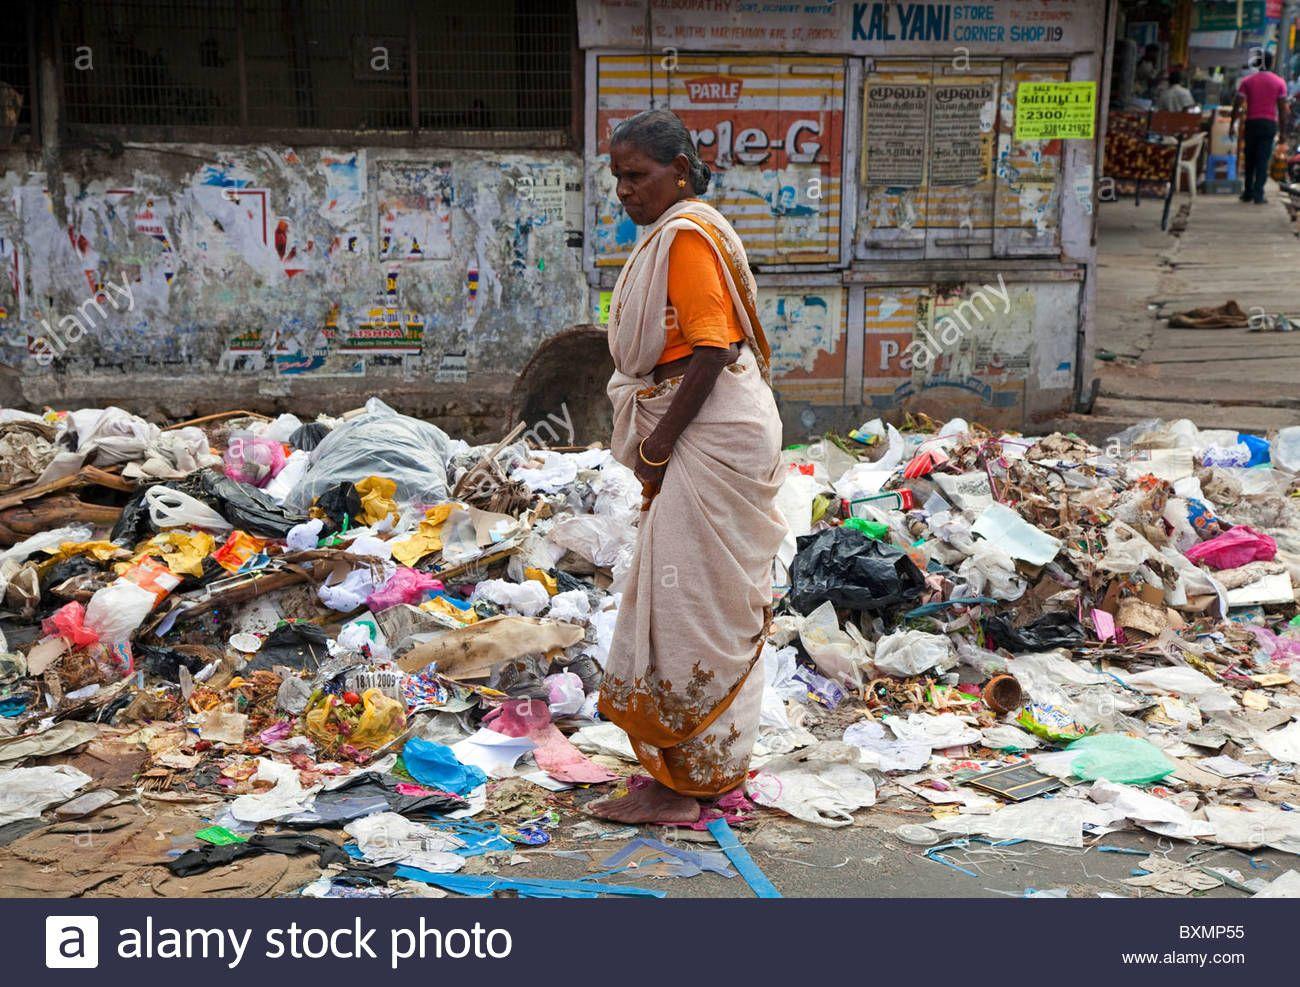 Garbage problem in the streets of Pondicherry, Tamil Nadu